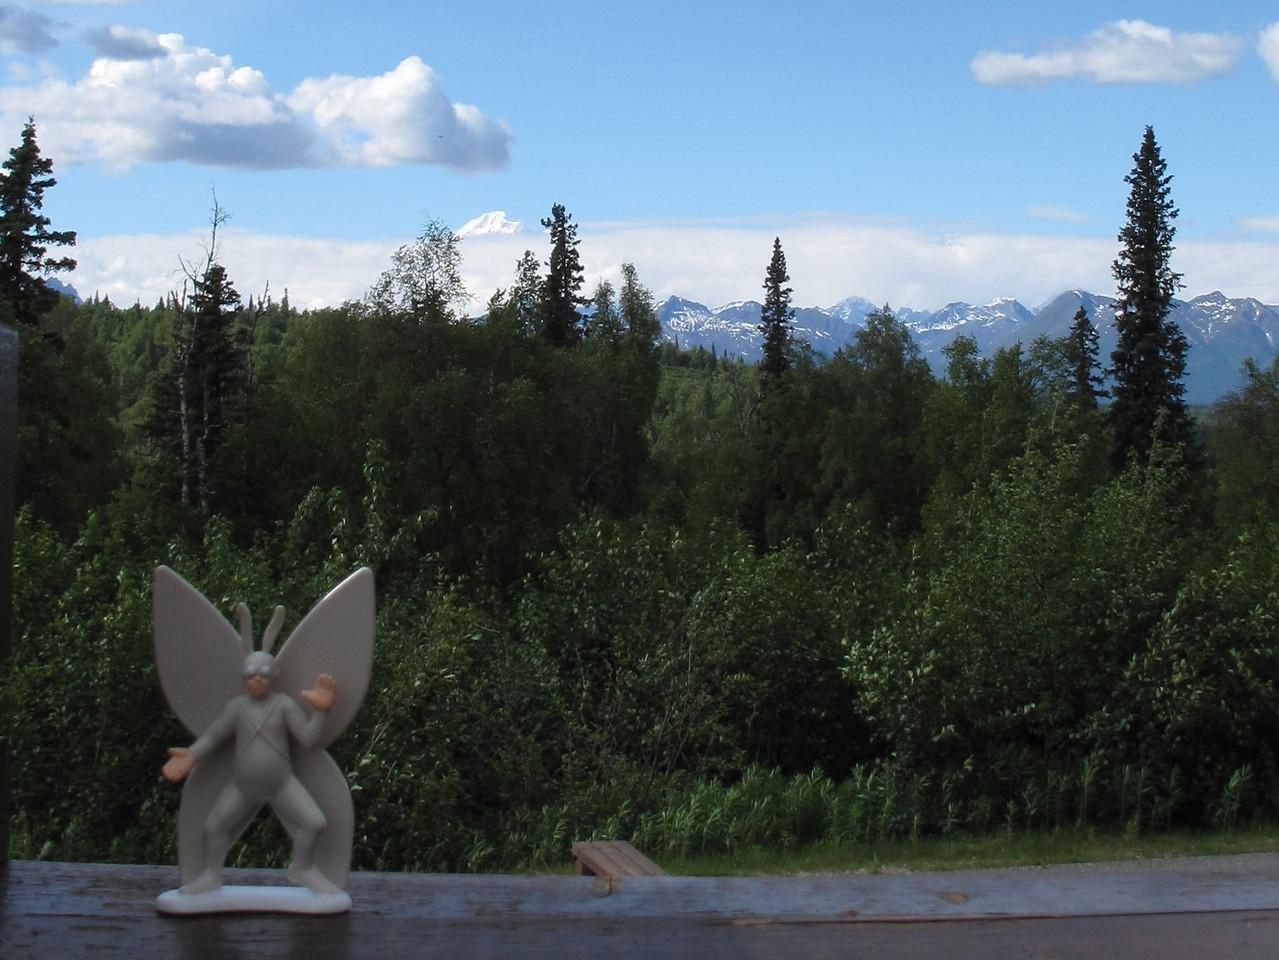 2010-06-05 Mt. McKinley, Alaska